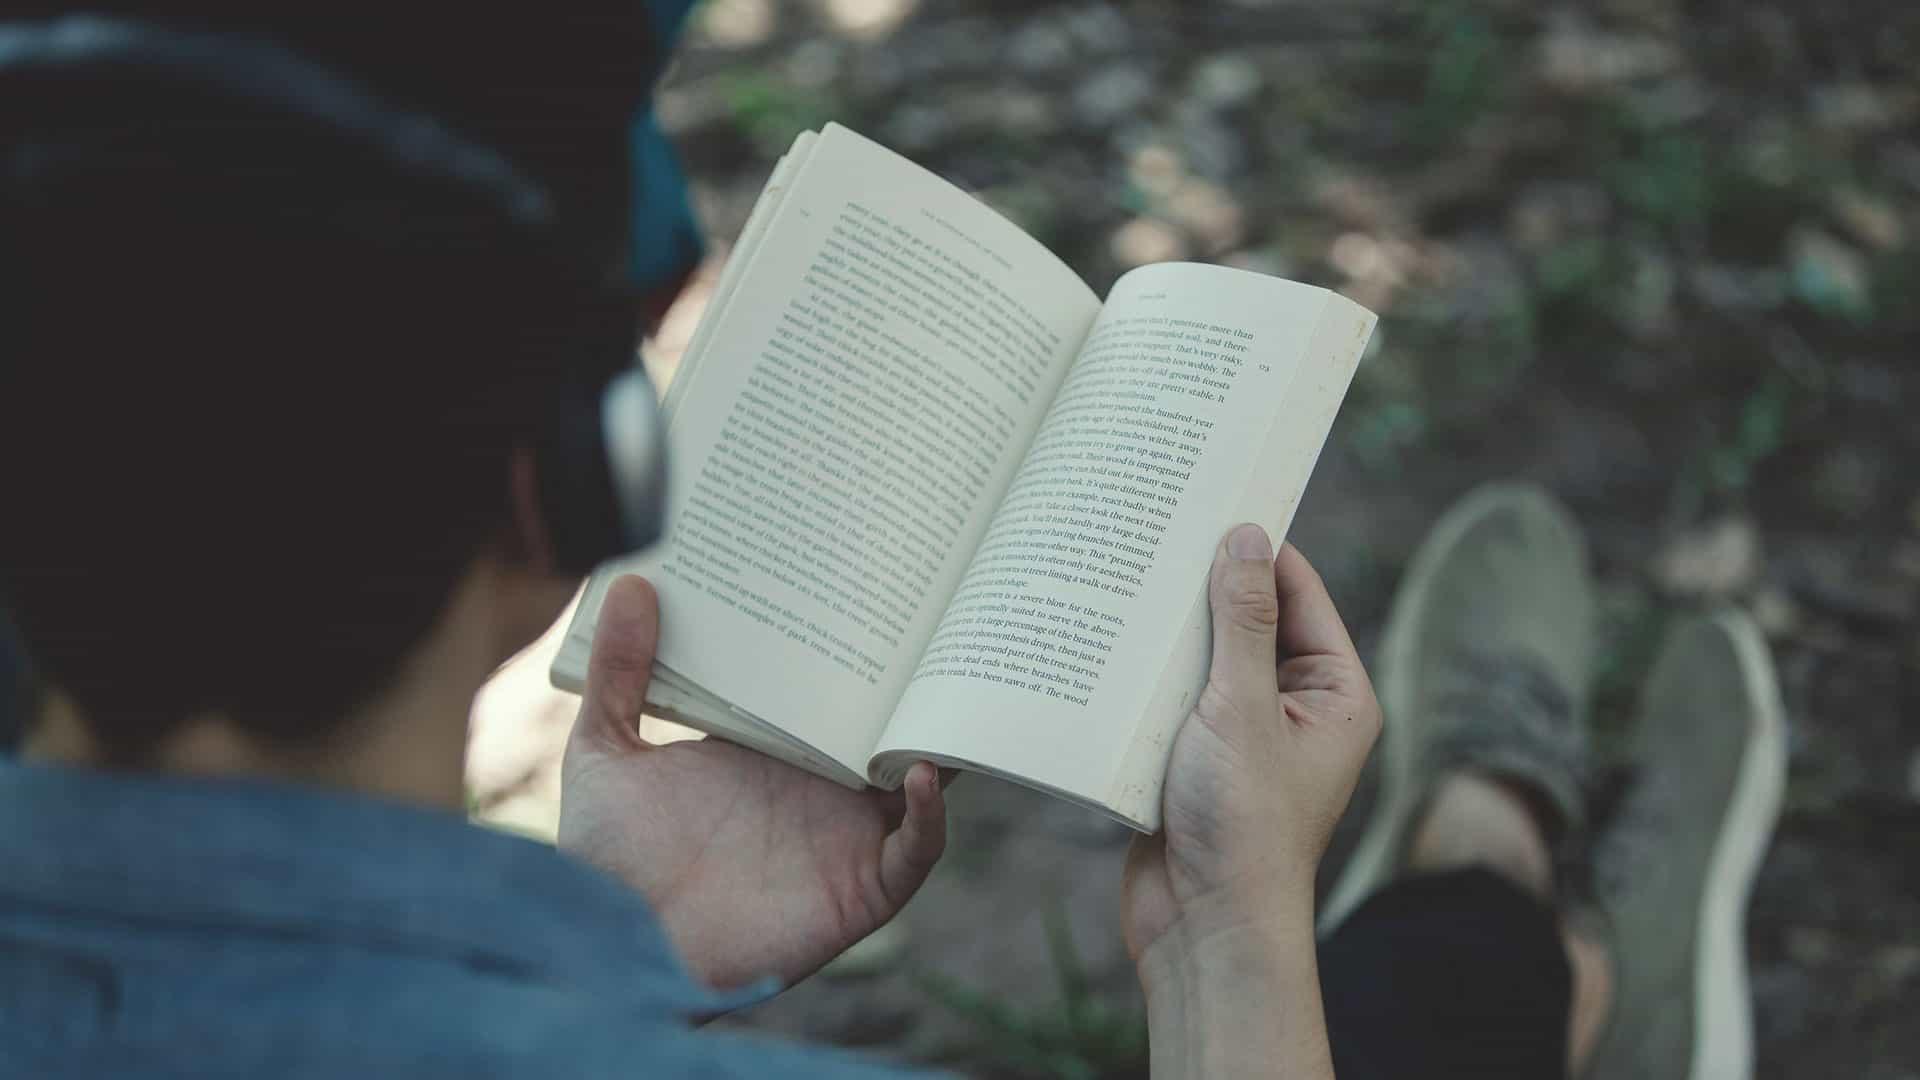 Åest kratkih biznis knjiga